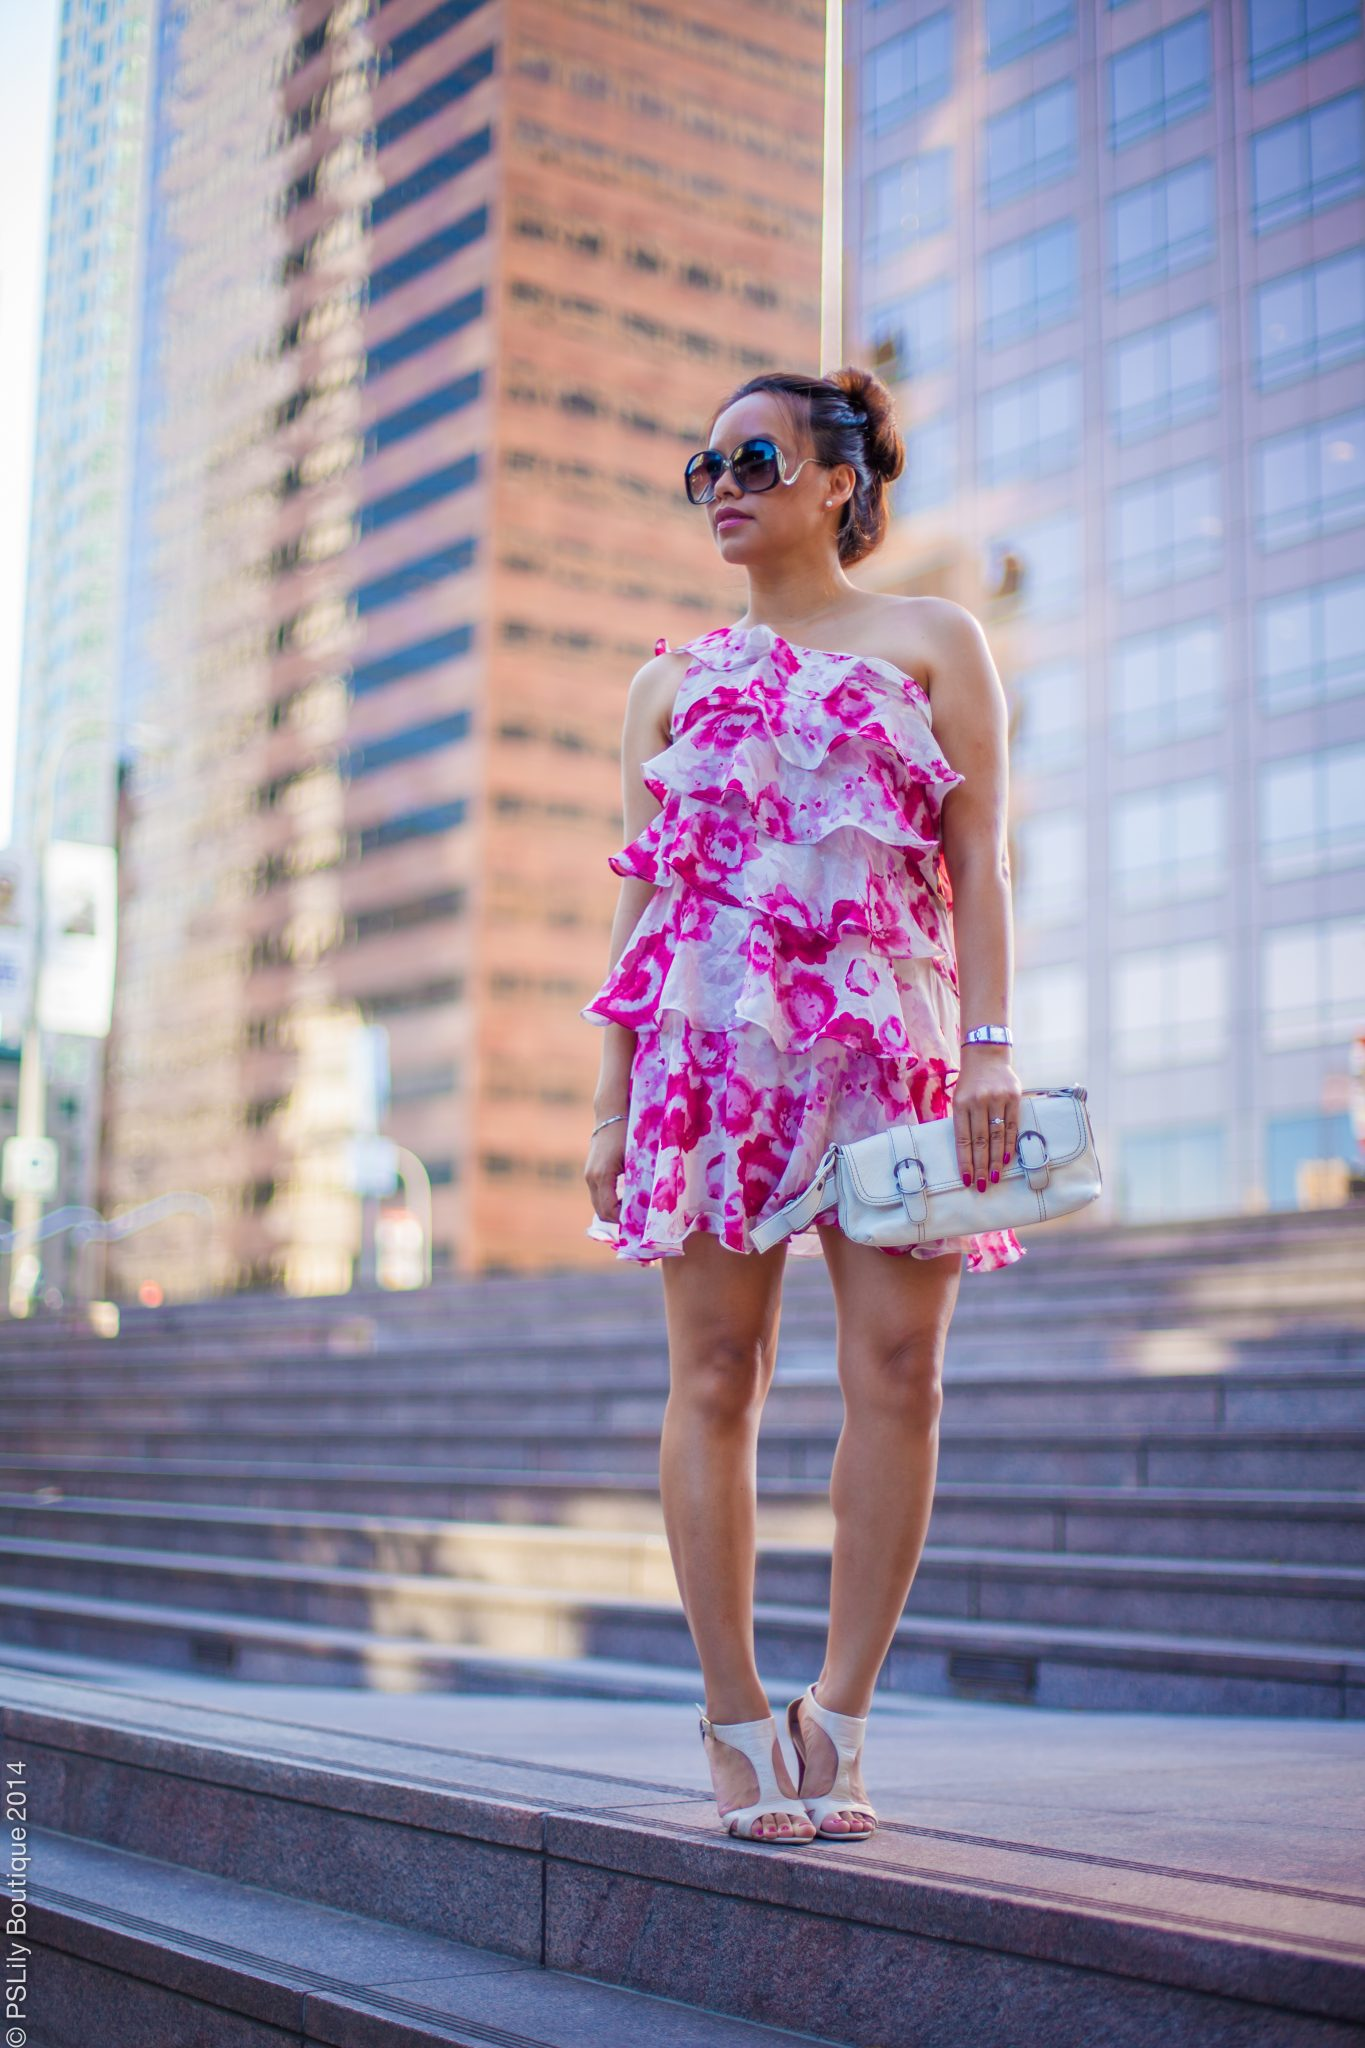 instagram-pslilyboutique-la-fashion-blogger-top-fashion-blogger-pink-floral-ruffle-dress-dtla